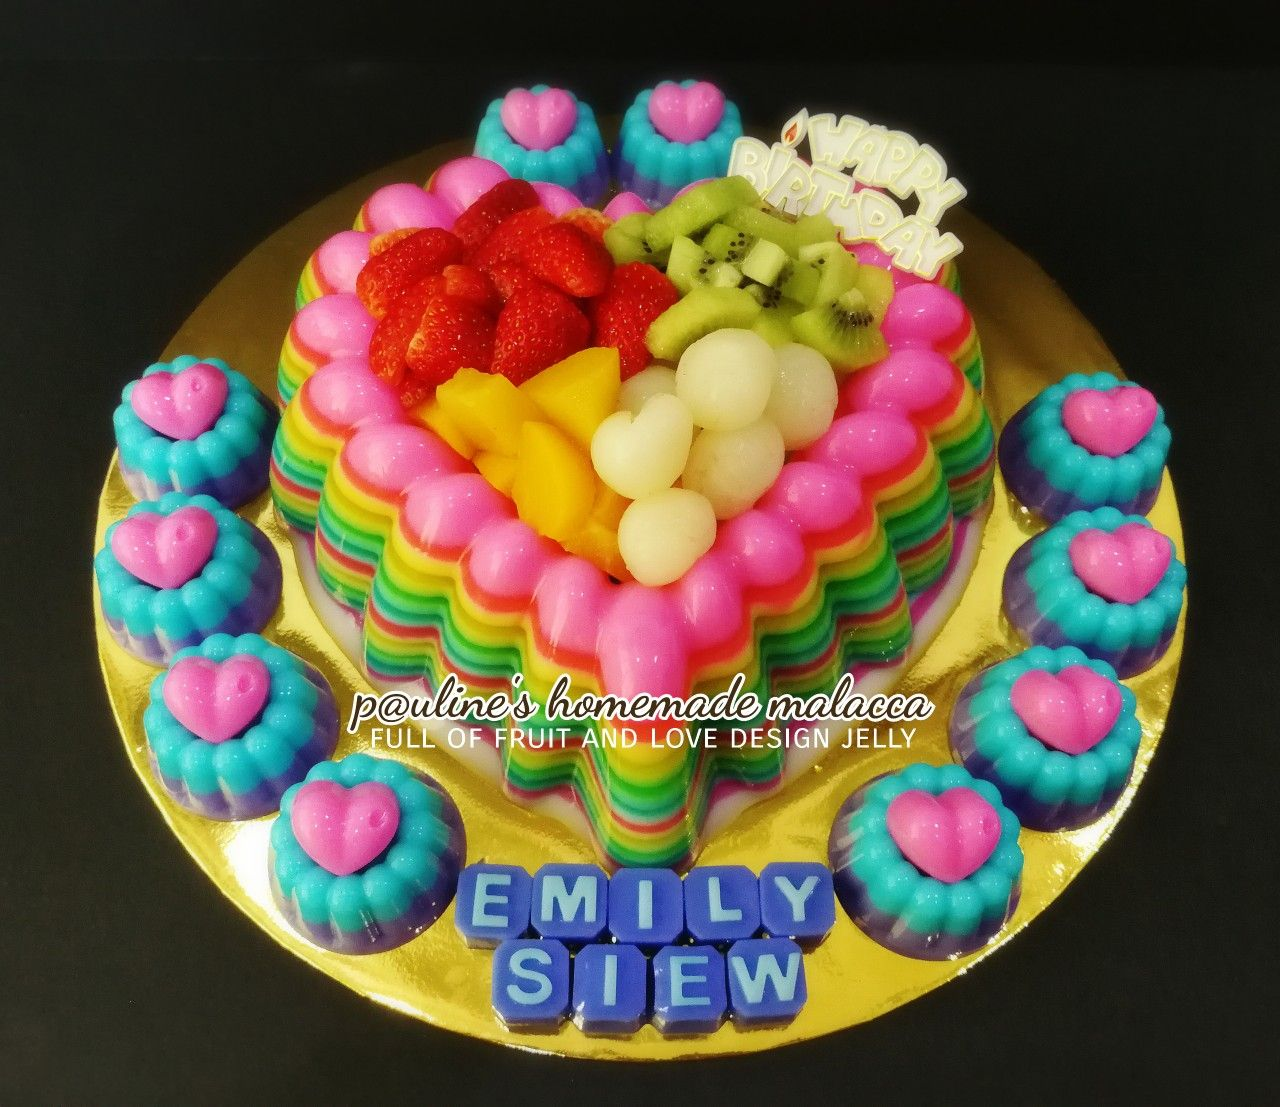 Paulineshomemademalacca Jelly Cake Cake Jelly